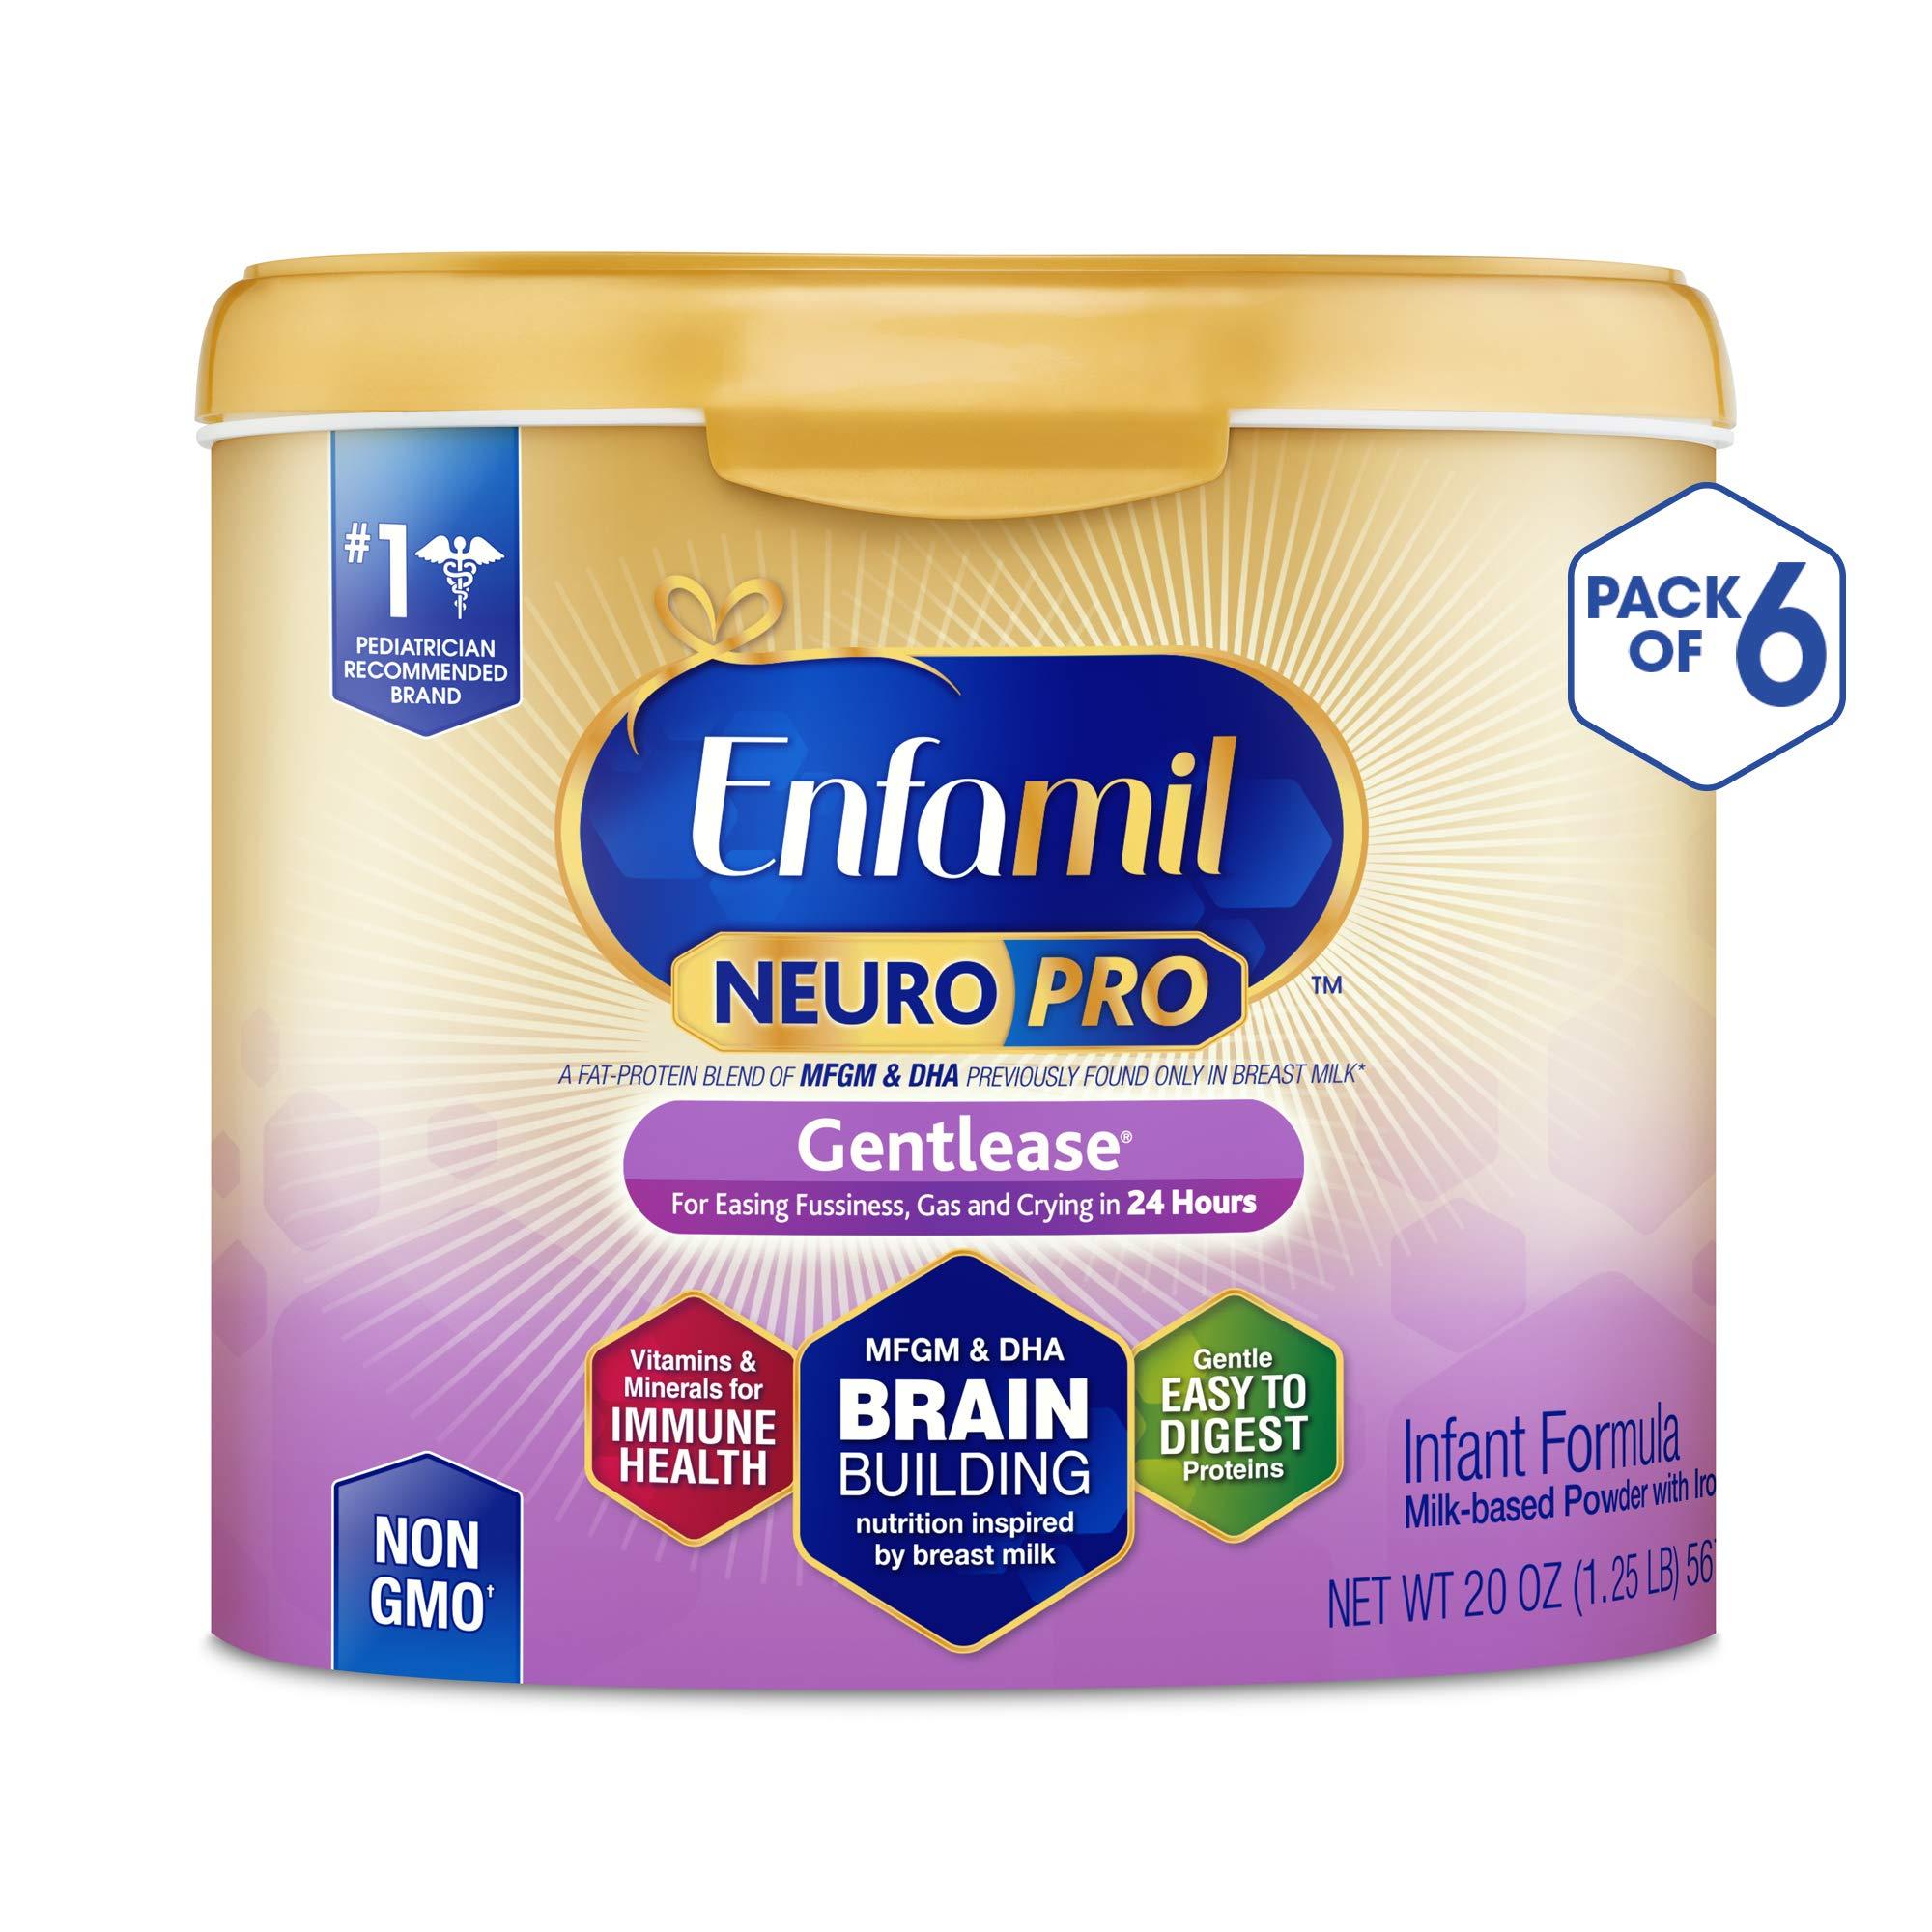 Enfamil NeuroPro Gentlease Baby Formula Milk Powder, 20 Ounce (Pack of 6), Omega 3 DHA, Probiotics, Iron